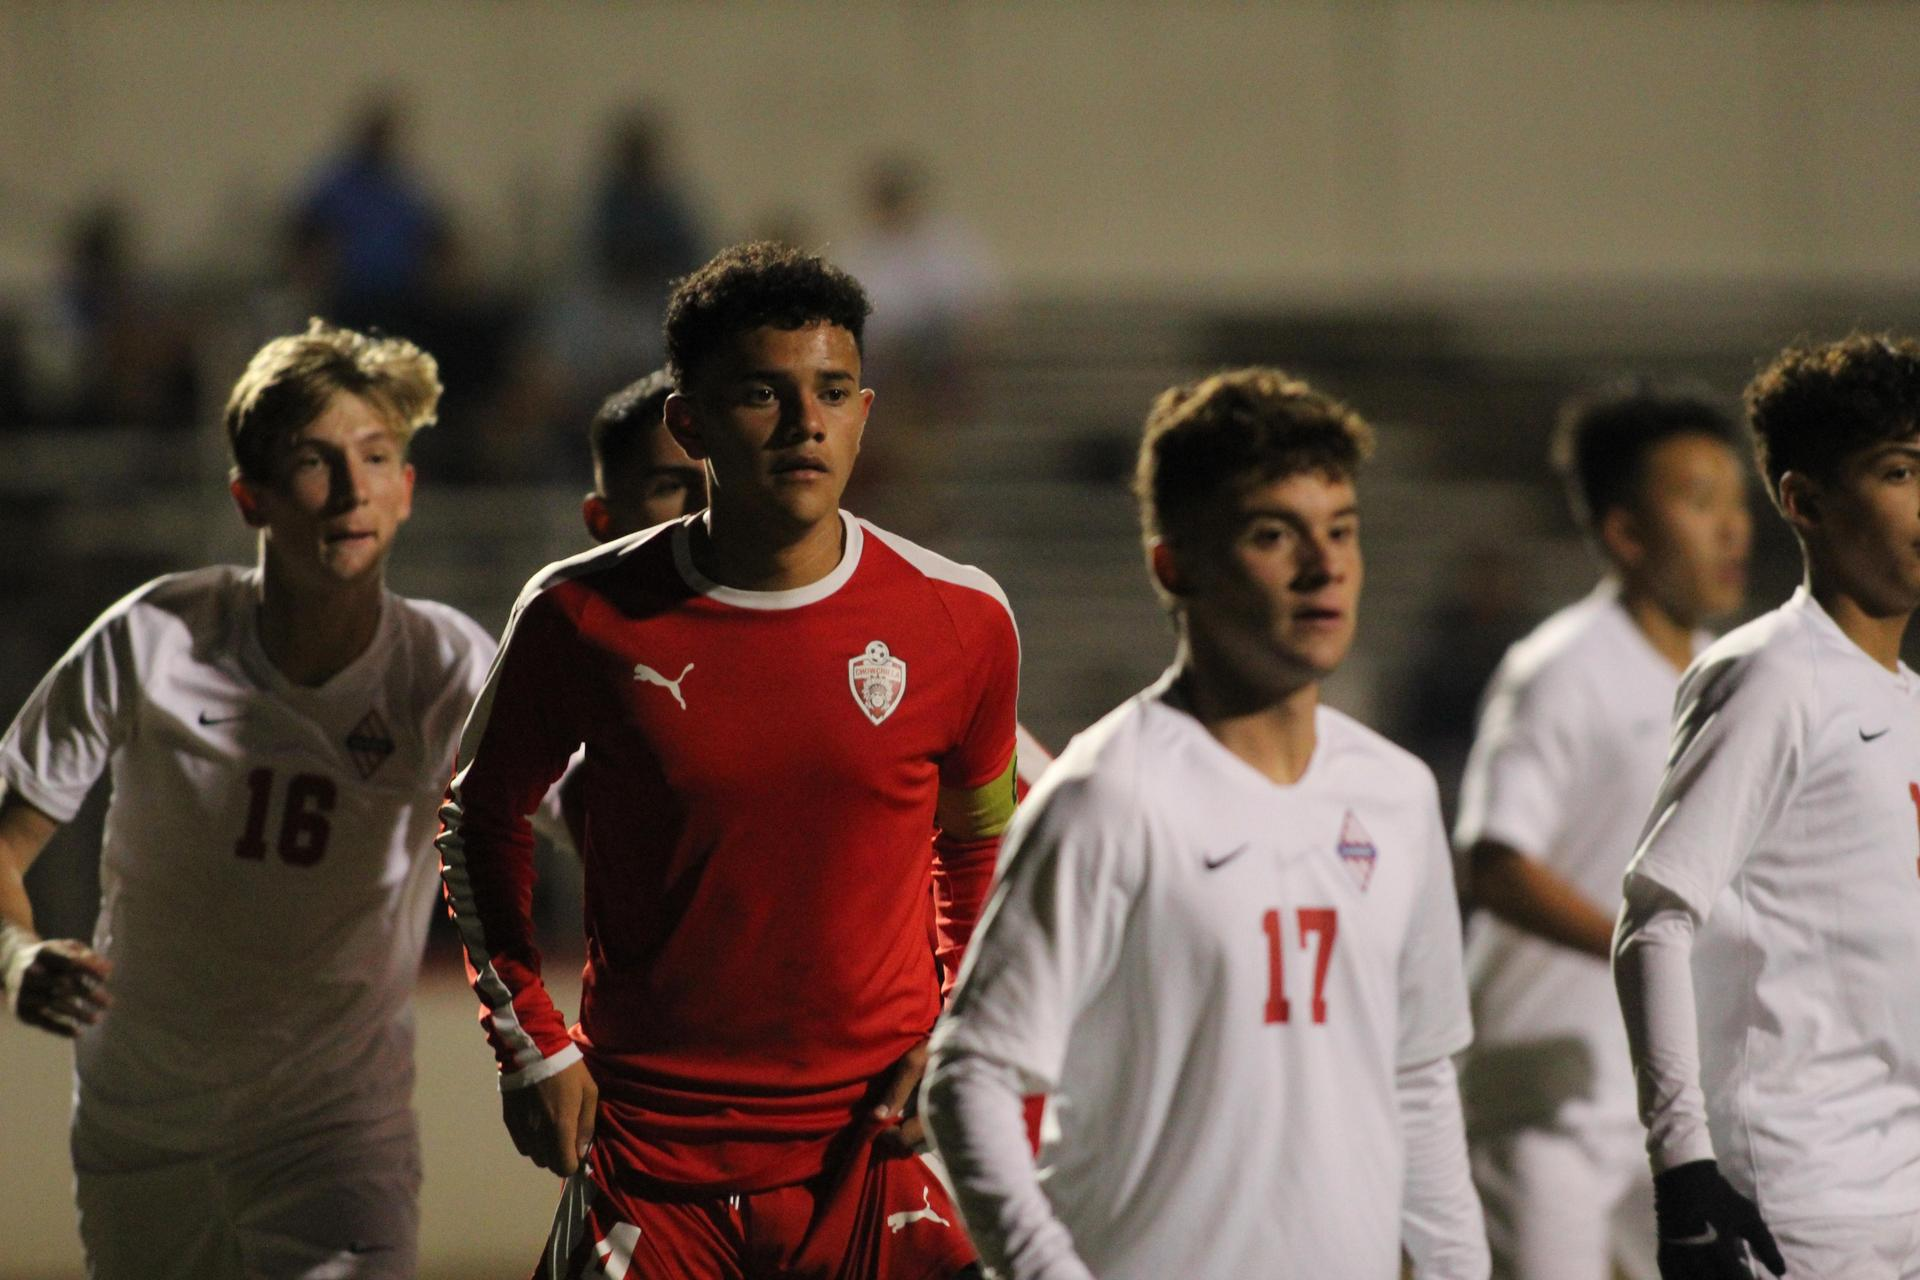 Antonio Ochoa looking down the field